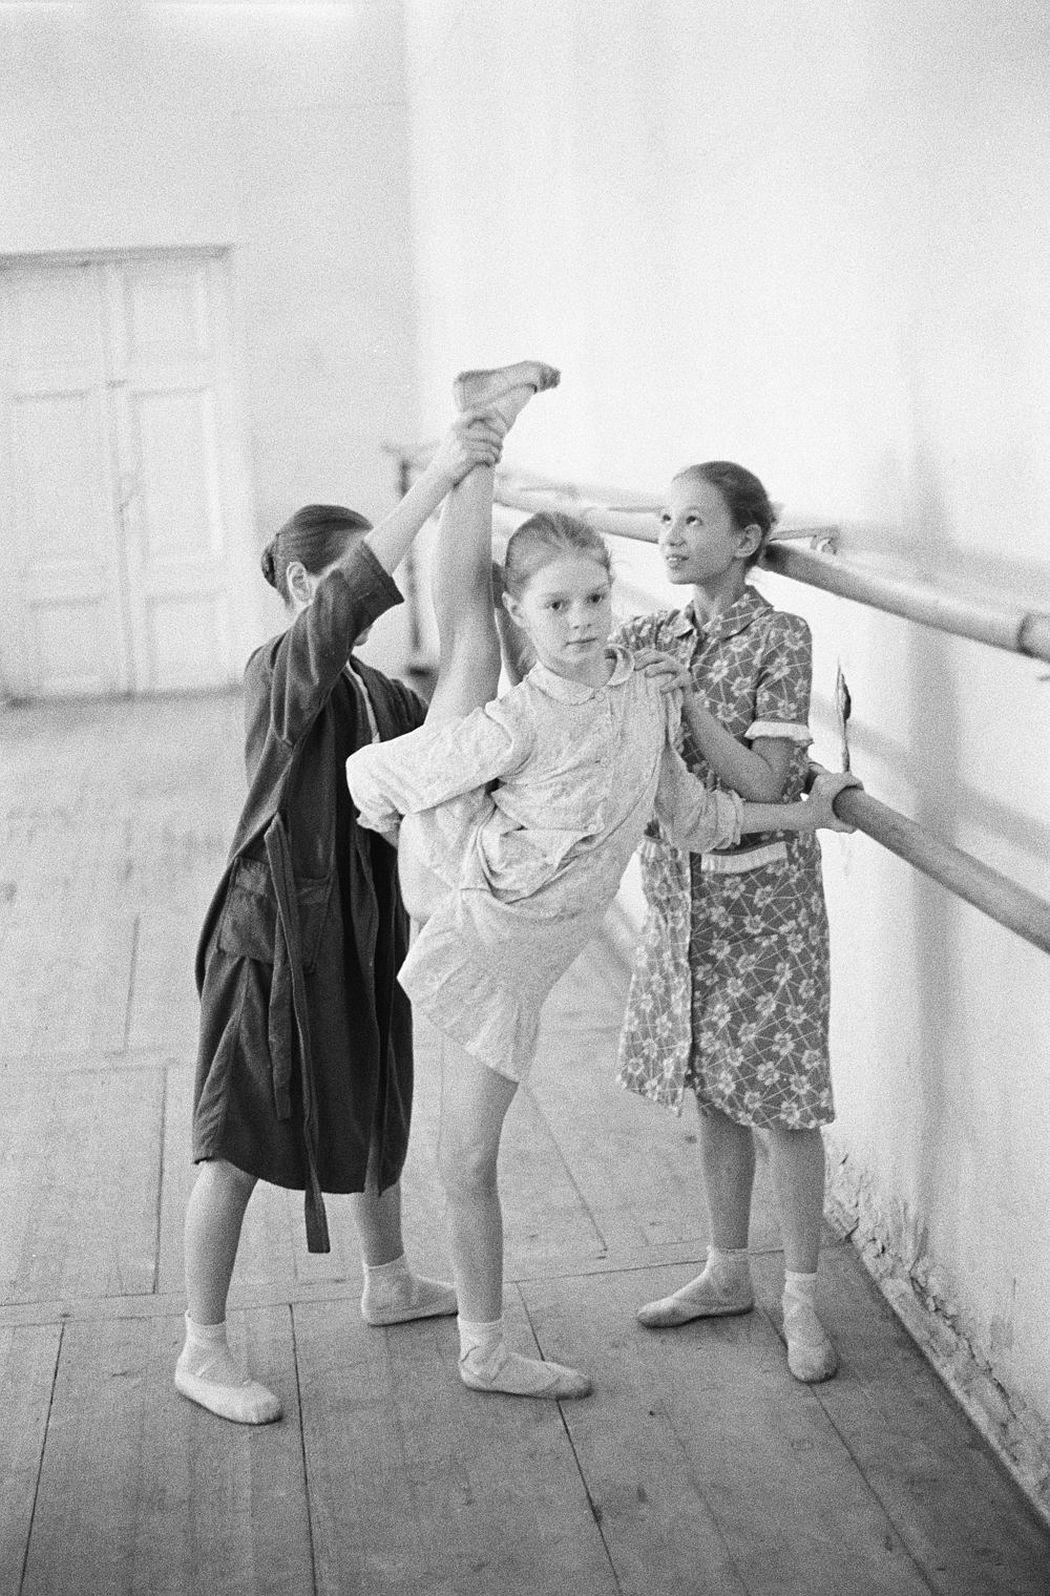 Arthur Elgort: Ballet